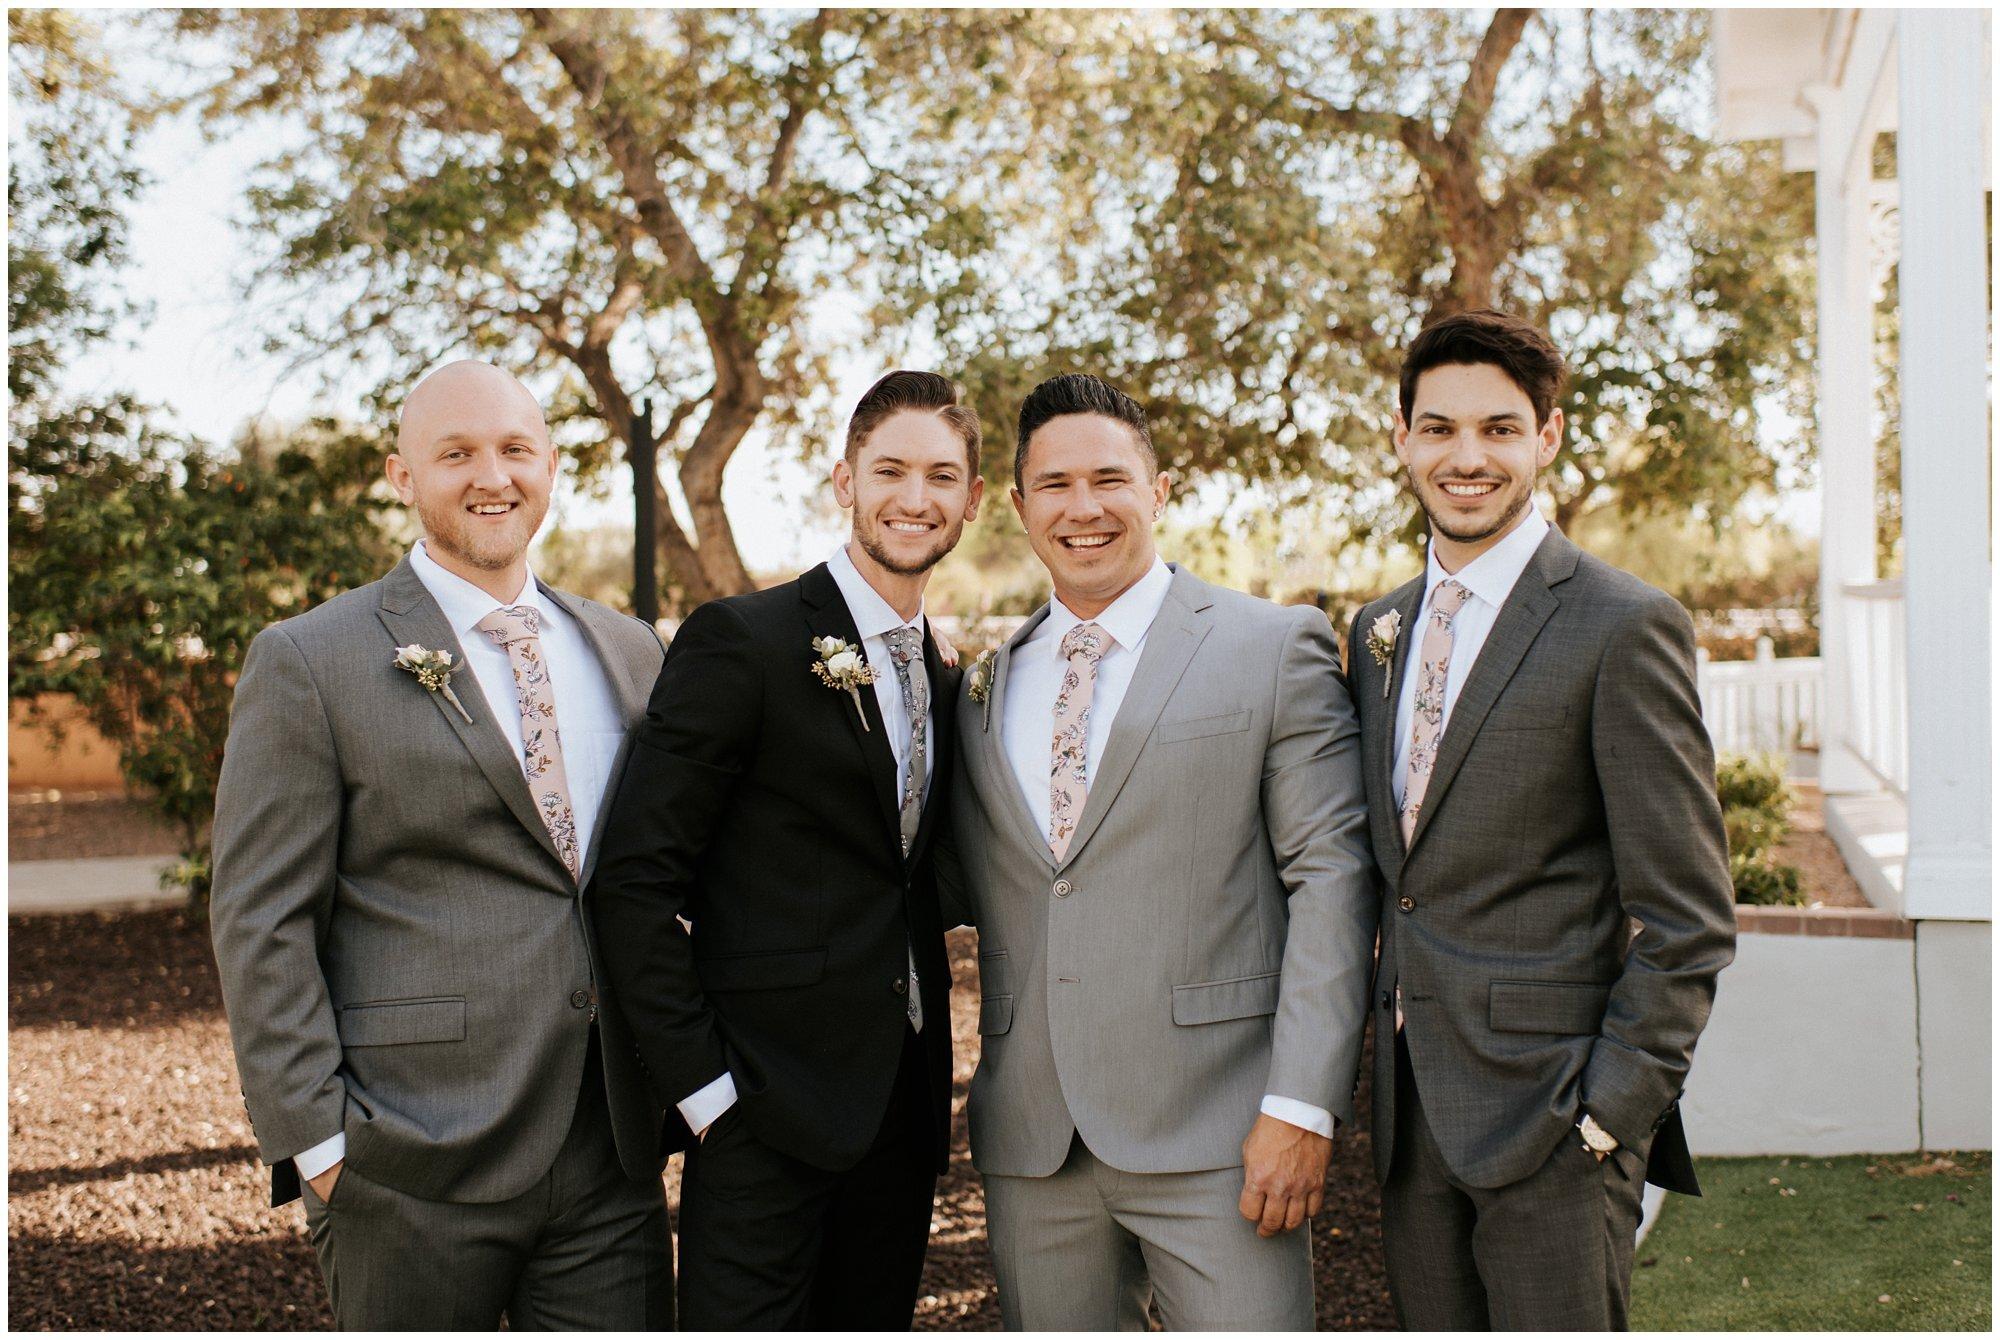 Wedgewood_Lindsay_Groves-Arizona-Wedding-Photographer-M+C_0022.jpg